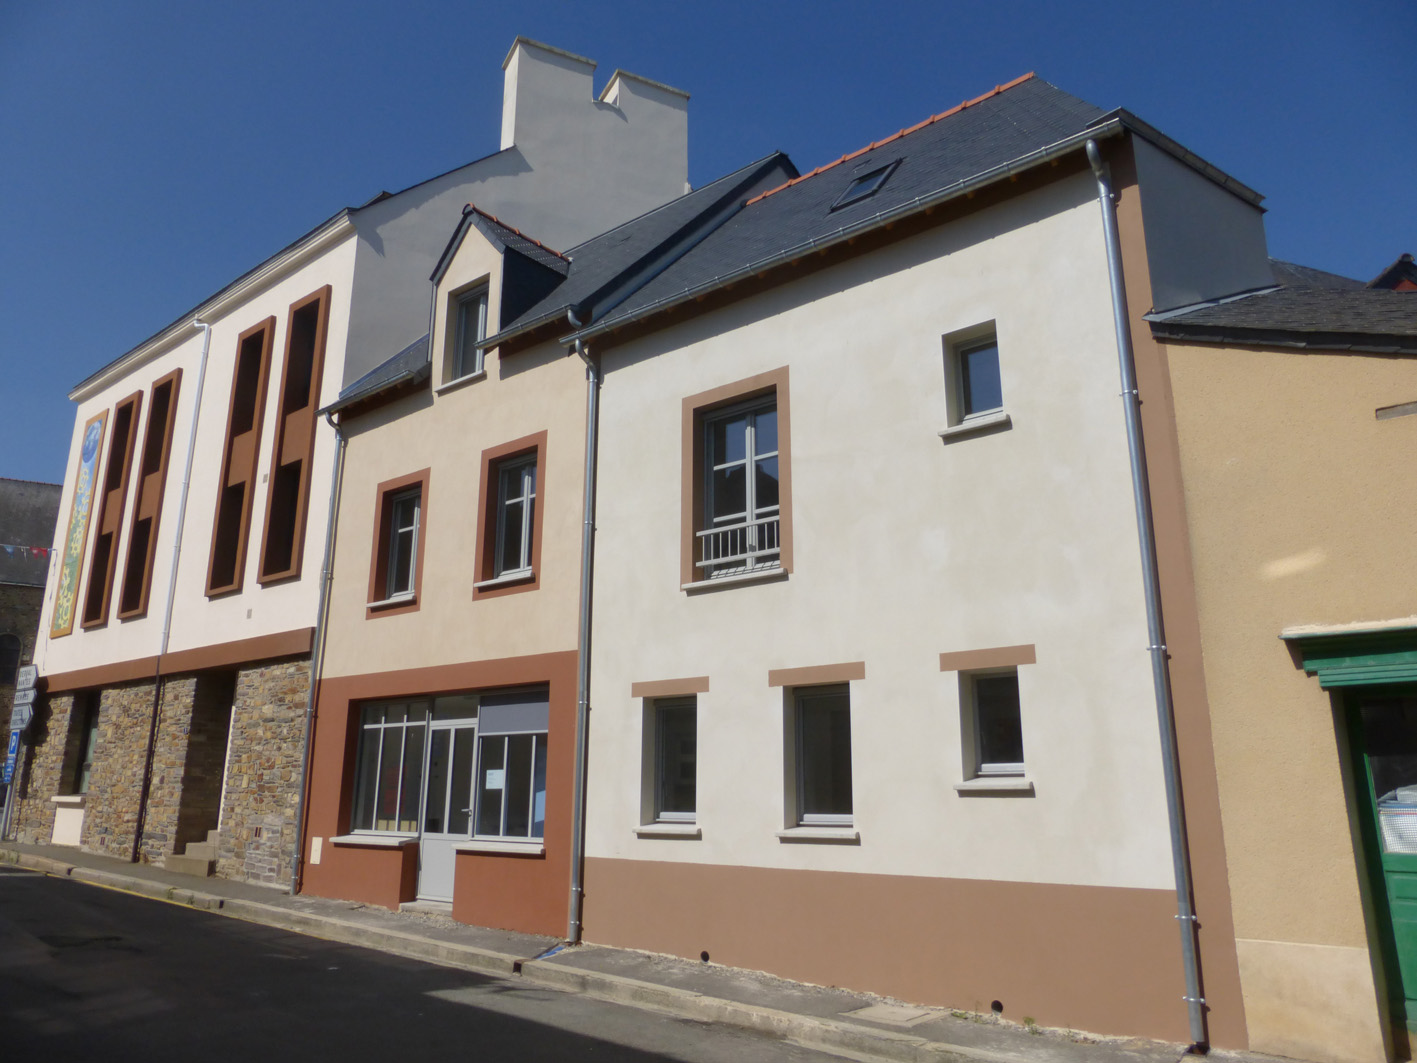 Immeuble grand fougeray klg architecte for Architecte du patrimoine